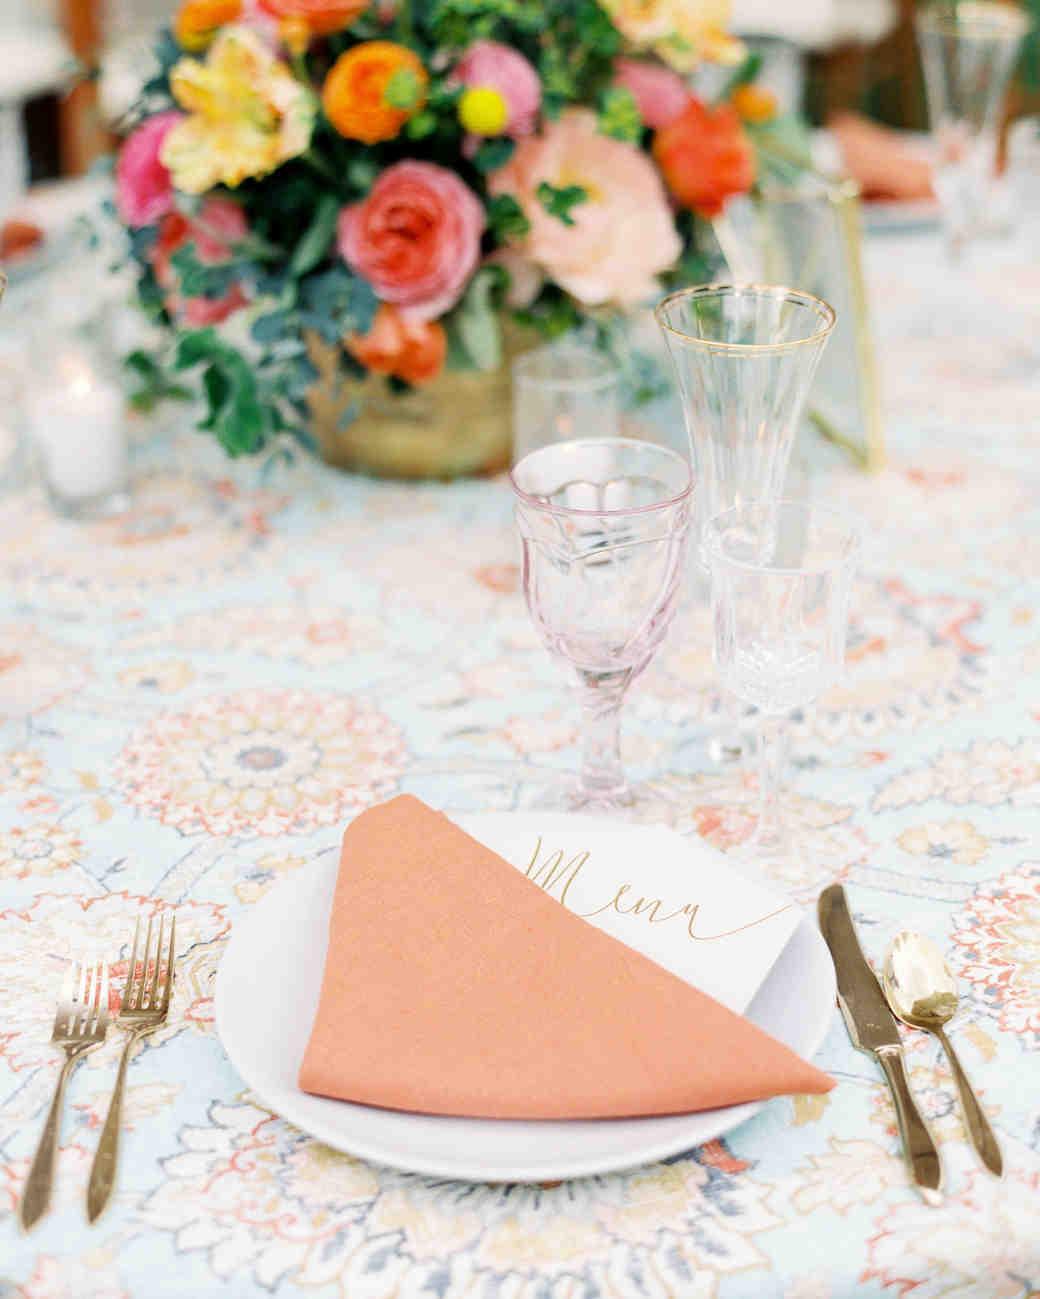 aubrey austin wedding place setting